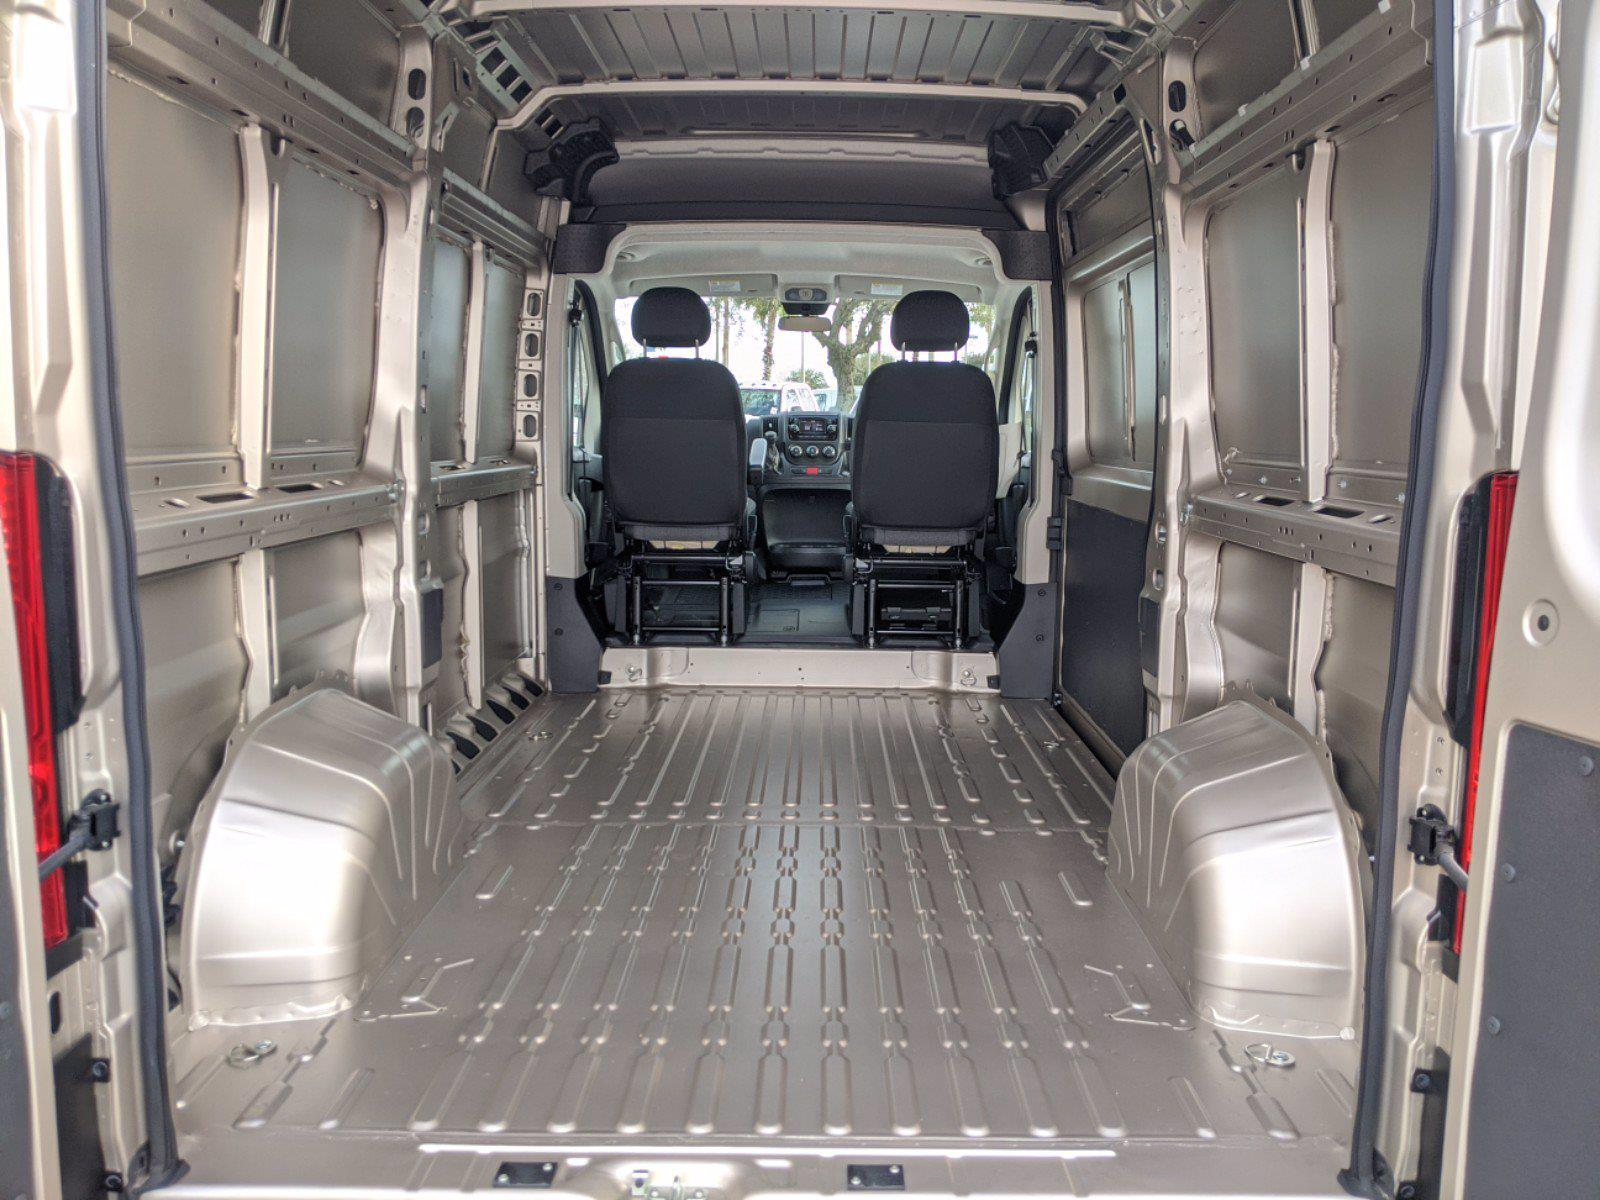 2021 Ram ProMaster 2500 High Roof FWD, Empty Cargo Van #R21160 - photo 1